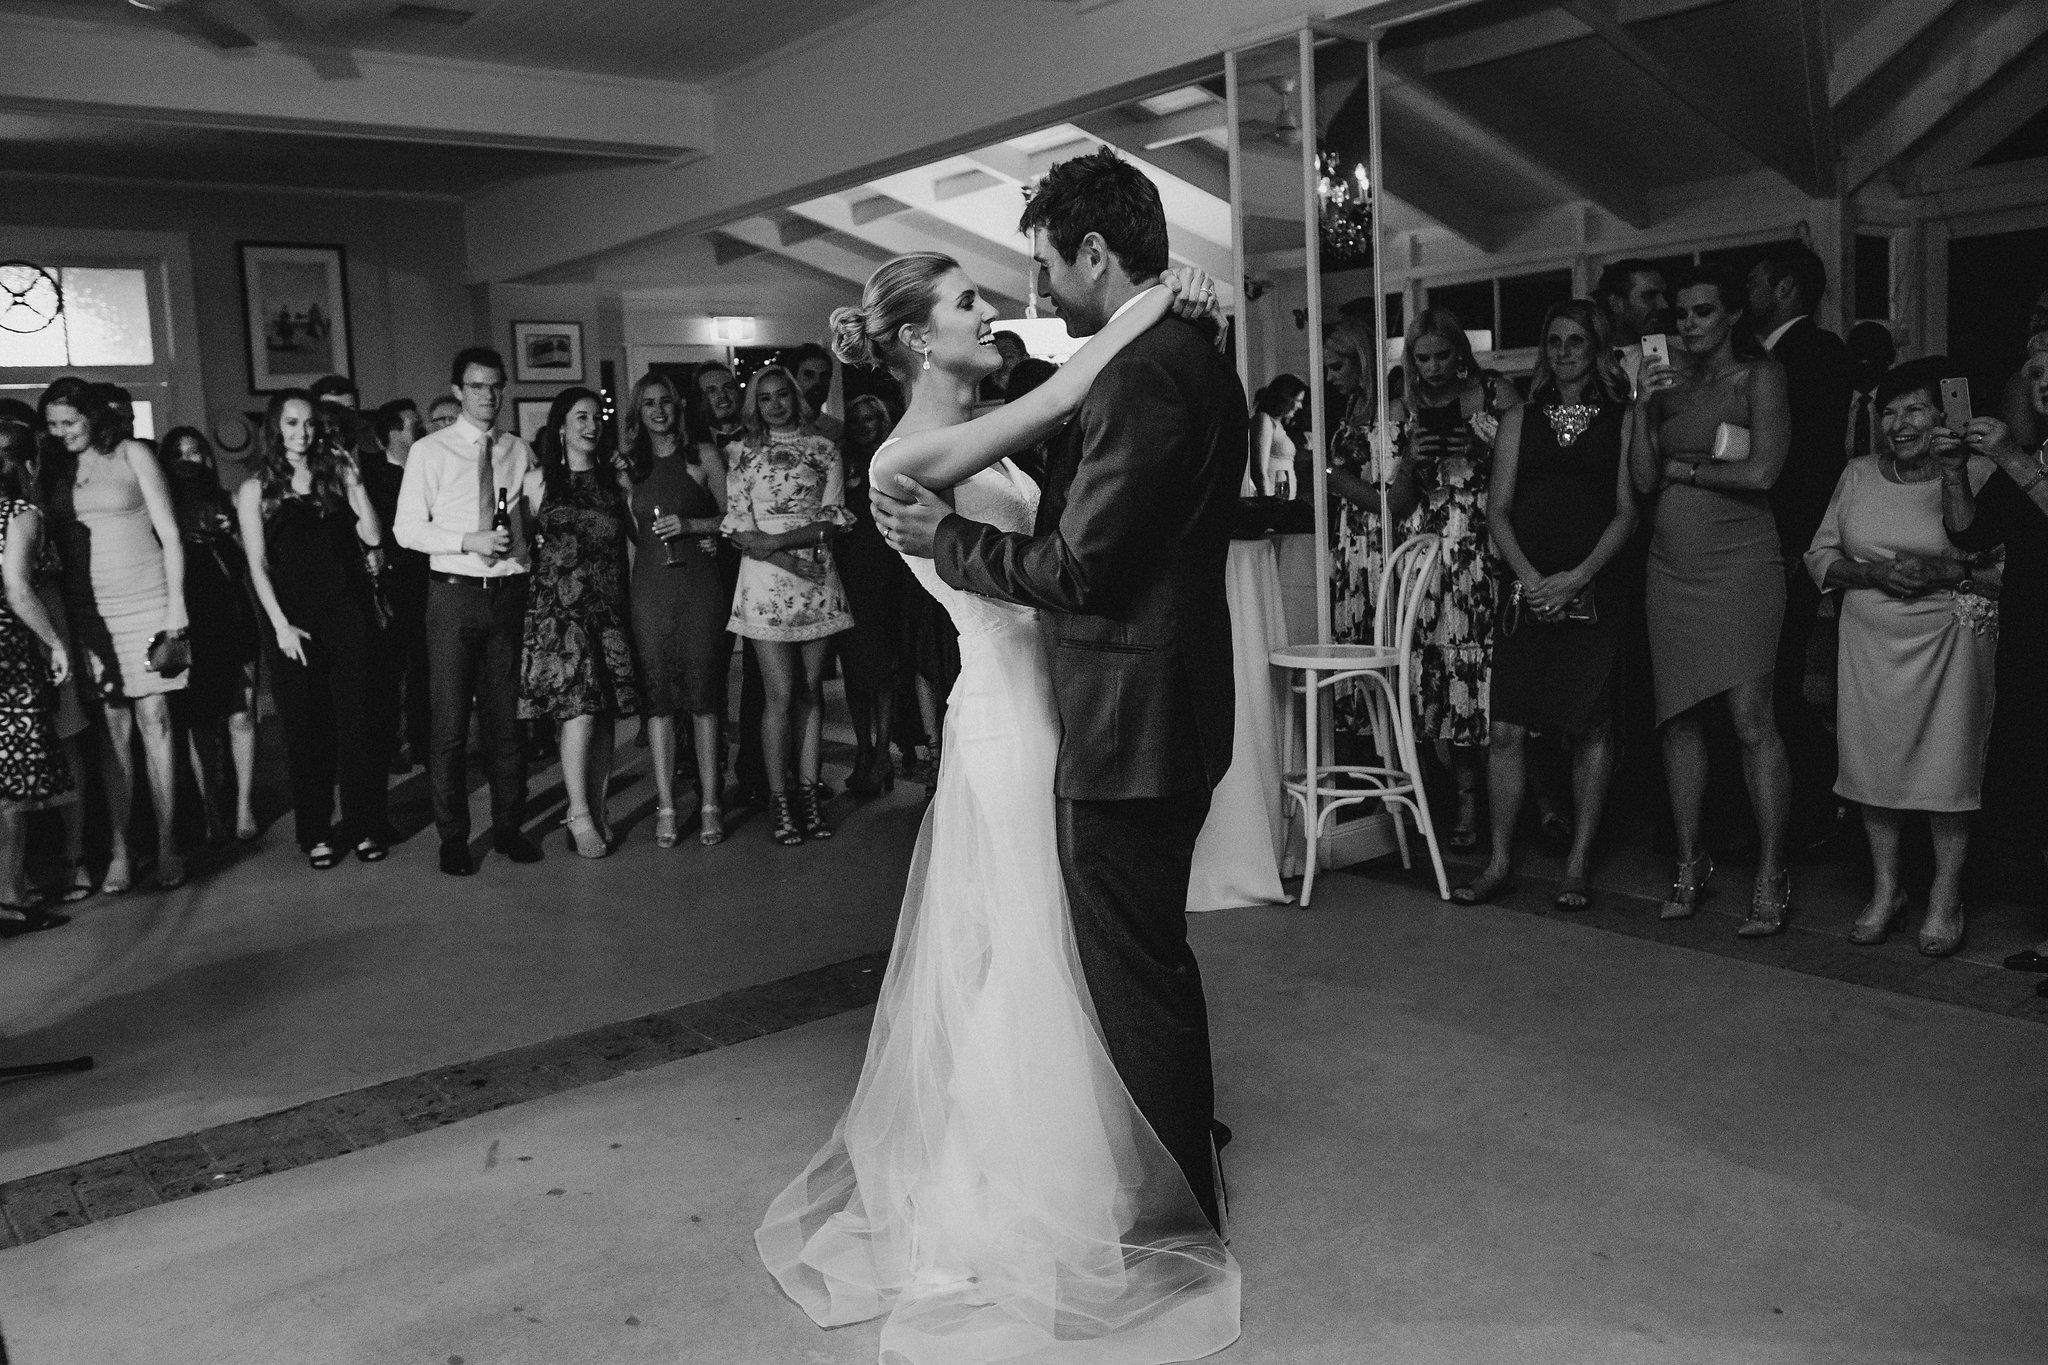 Hopewood House - Weddings - Constance & Nick - Shot 18 - The Pavilion (downstairs) - Dance.jpg